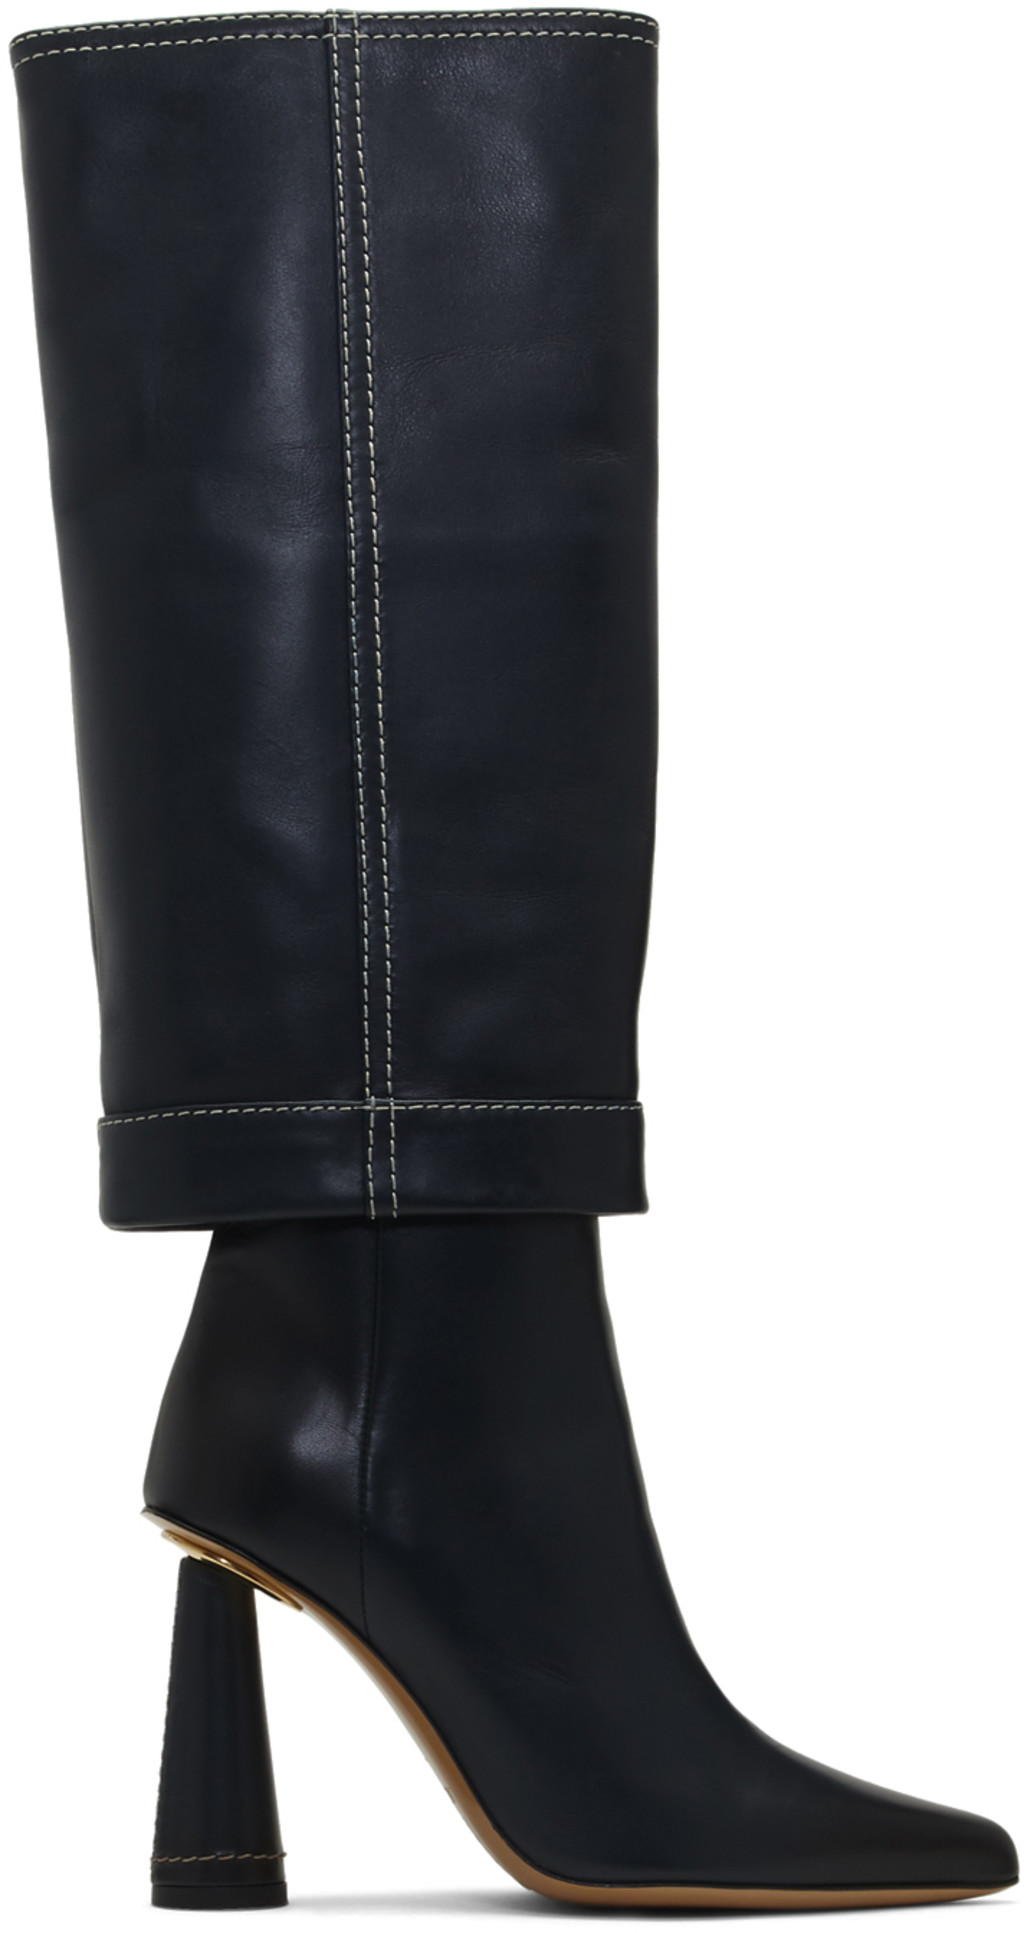 046545ffd3 Green 'Les Bottes Pantalon' Boots